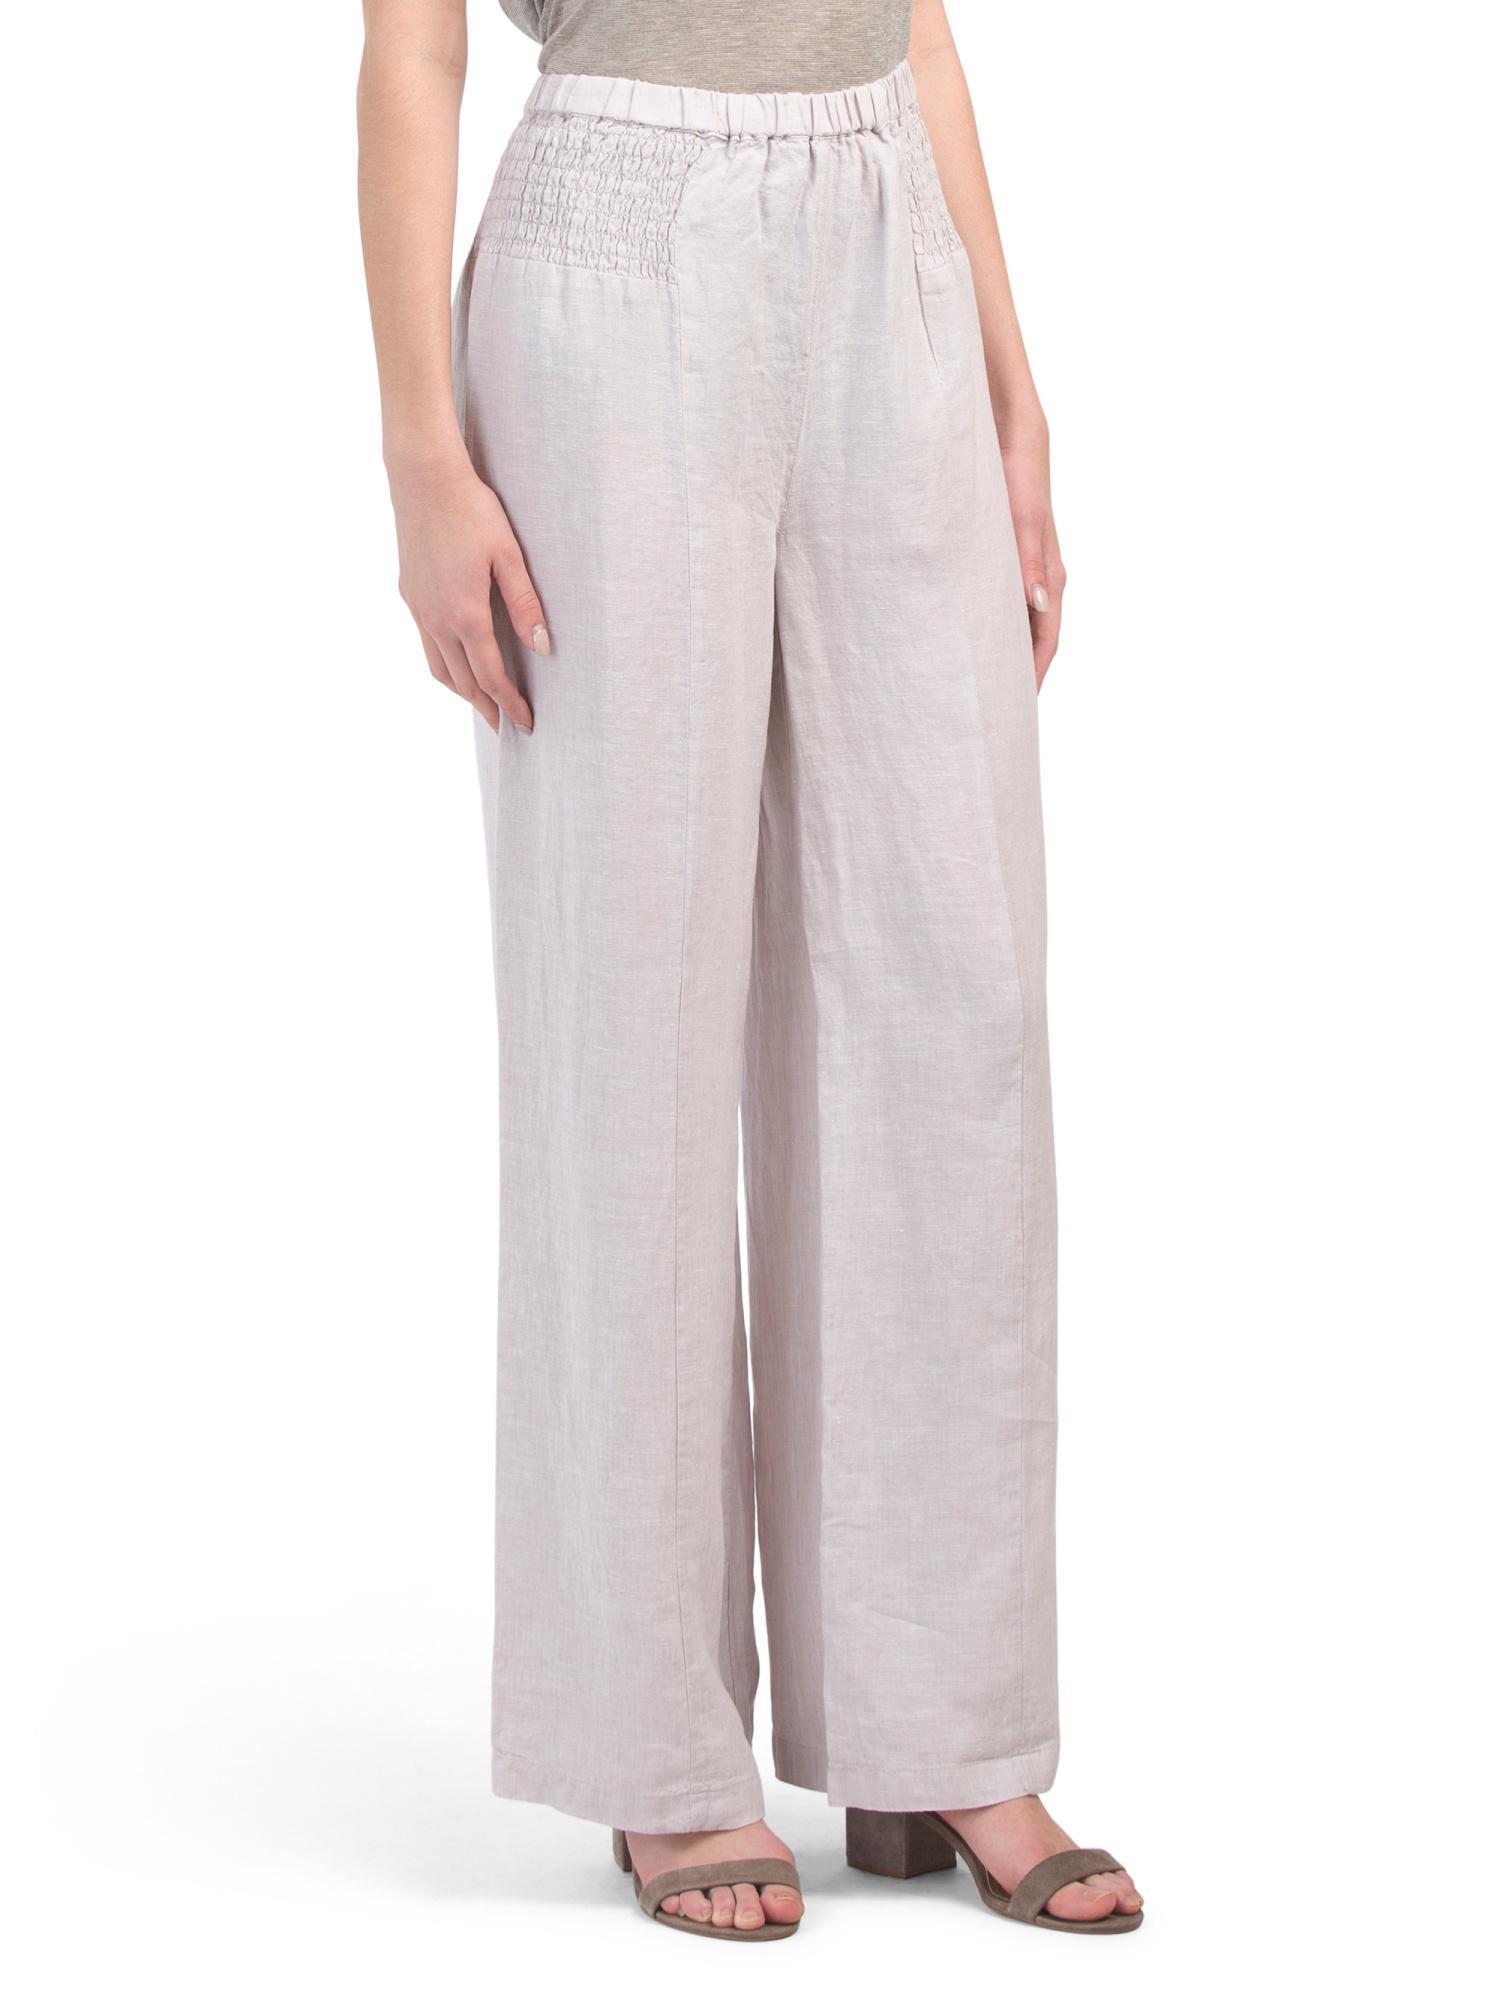 69b4d9444f2fd7 Tj Maxx - Multicolor Linen Pull On Smocked Waist Pants - Lyst. View  fullscreen